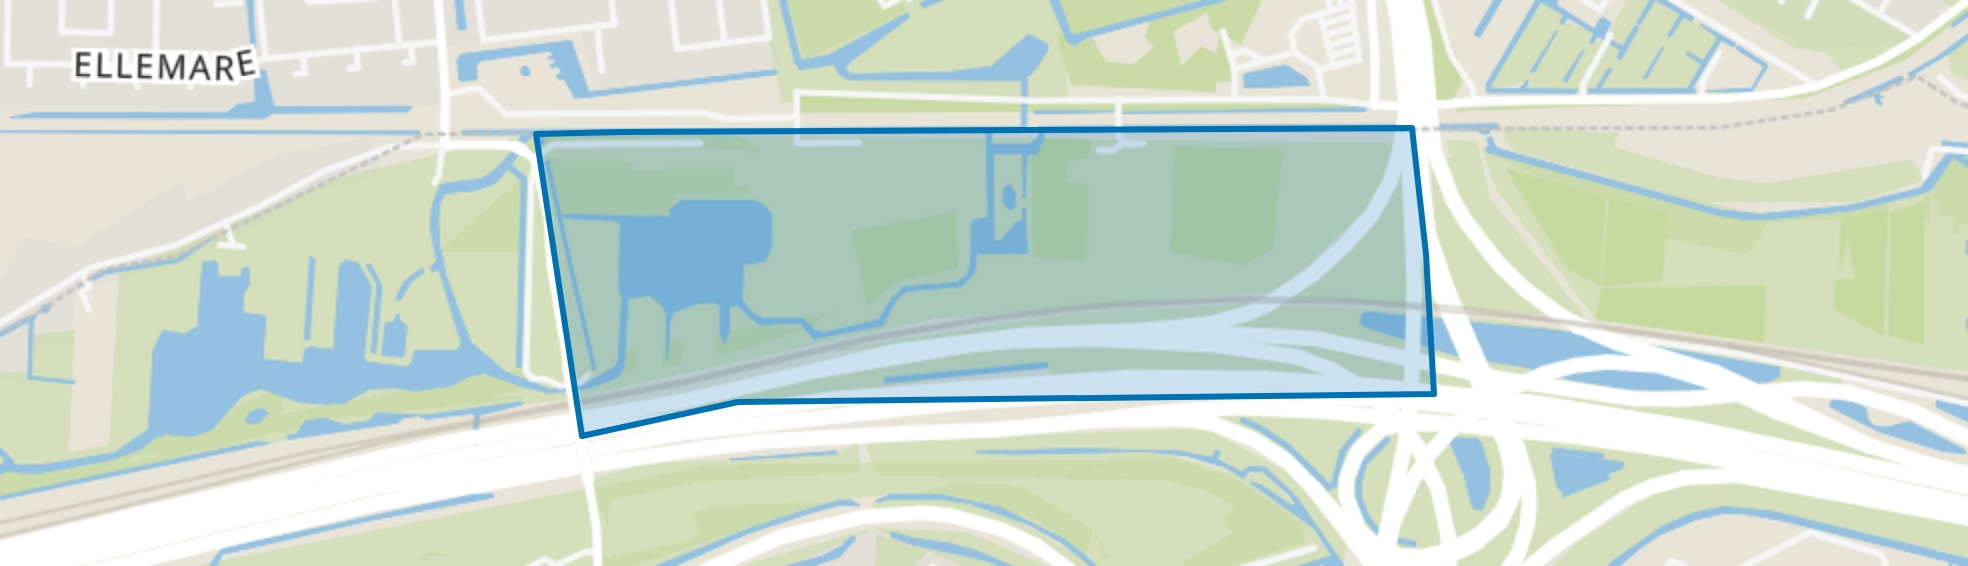 Vrijenburgbos, Barendrecht map